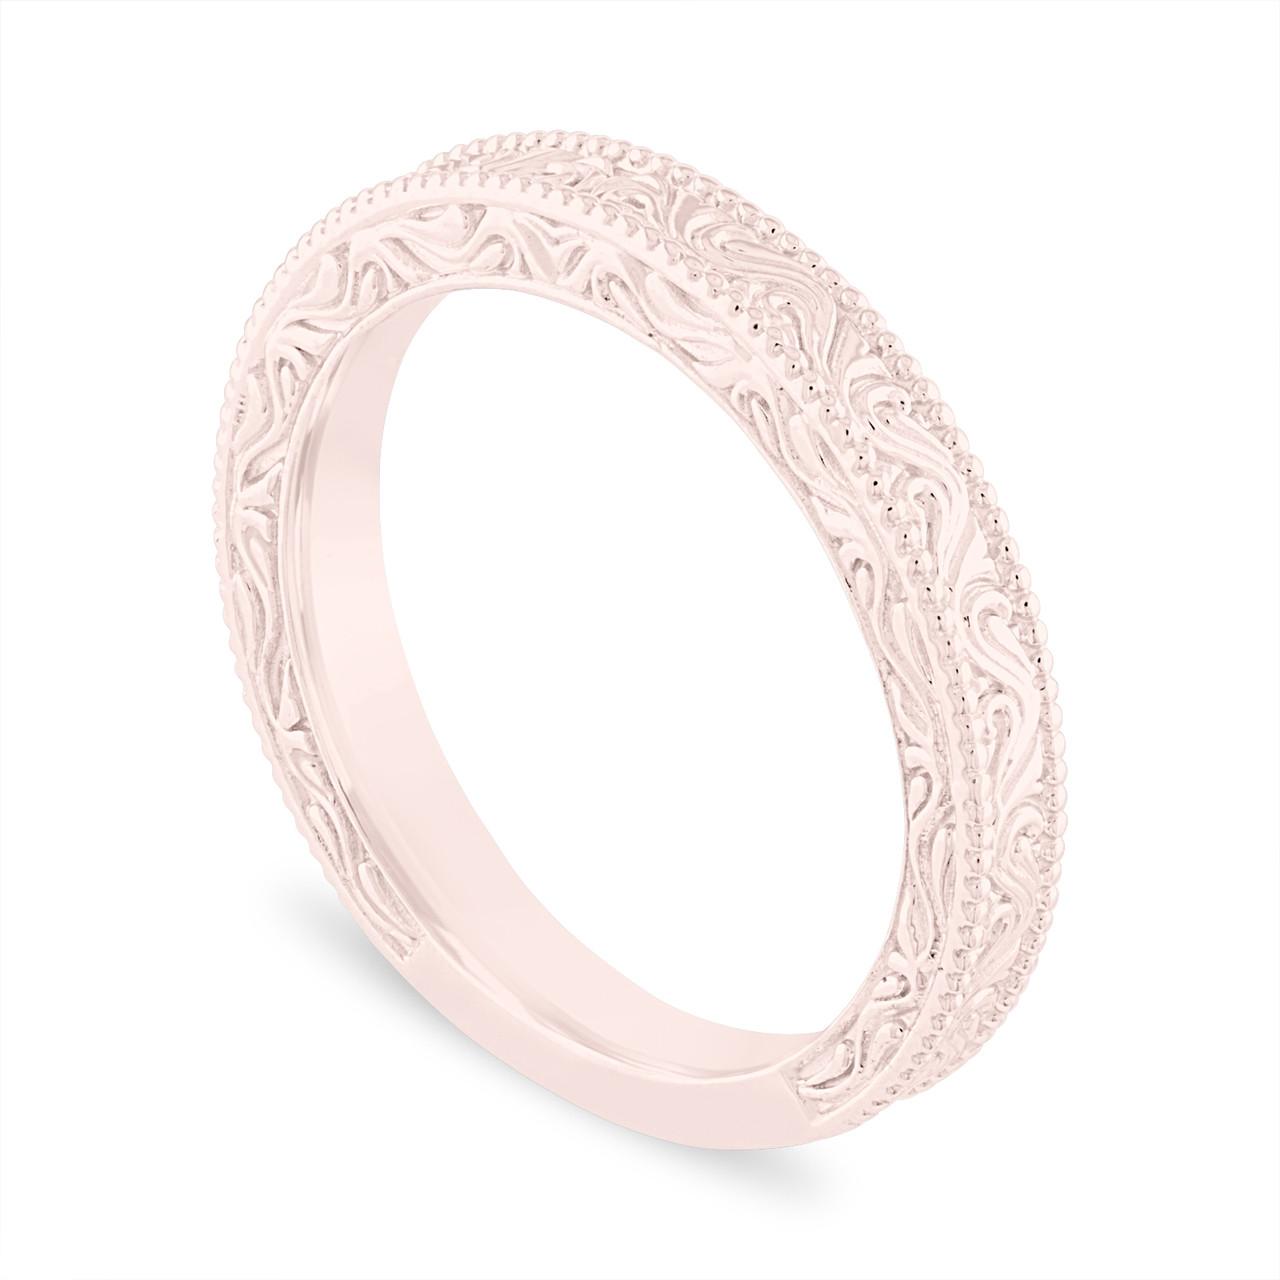 Filigree Wedding Band.Filigree Wedding Band Vintage Wedding Ring Anniversary Ring Antique Style Engraved 14k Rose Gold Handmade